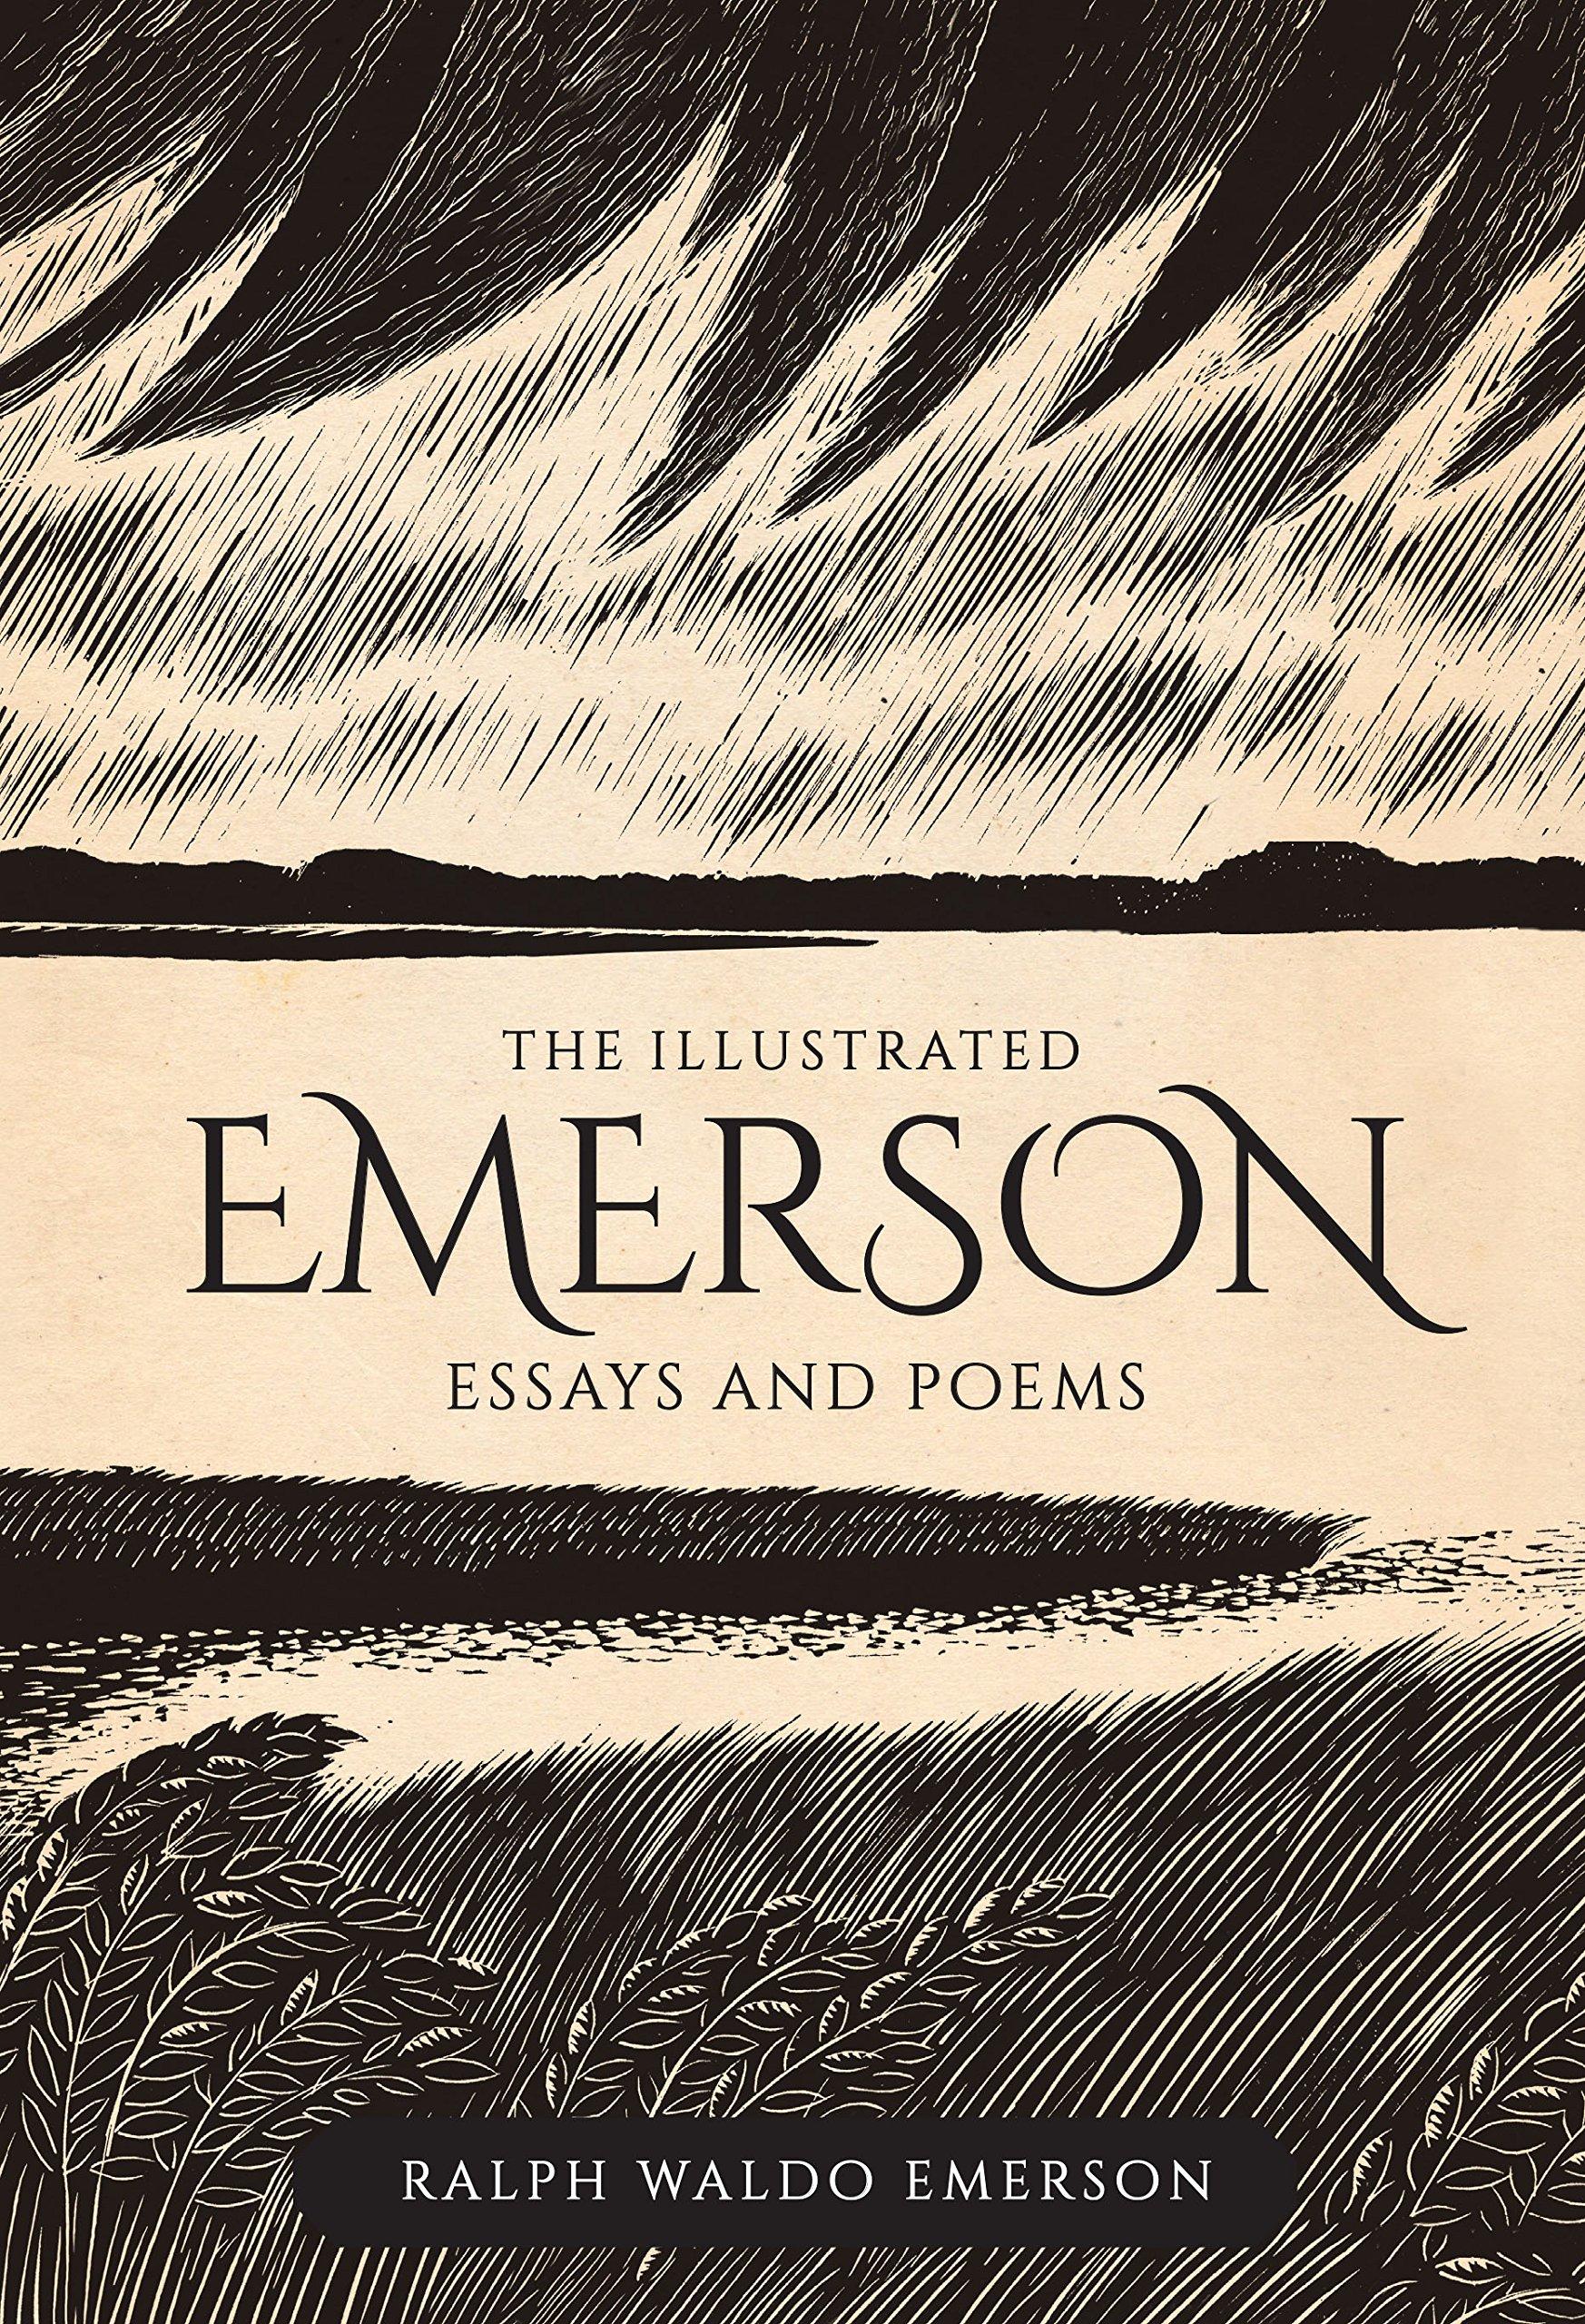 007 Essay Example Emerson Essays Dreaded Ralph Pdf First Series Summary Waldo Nature Full